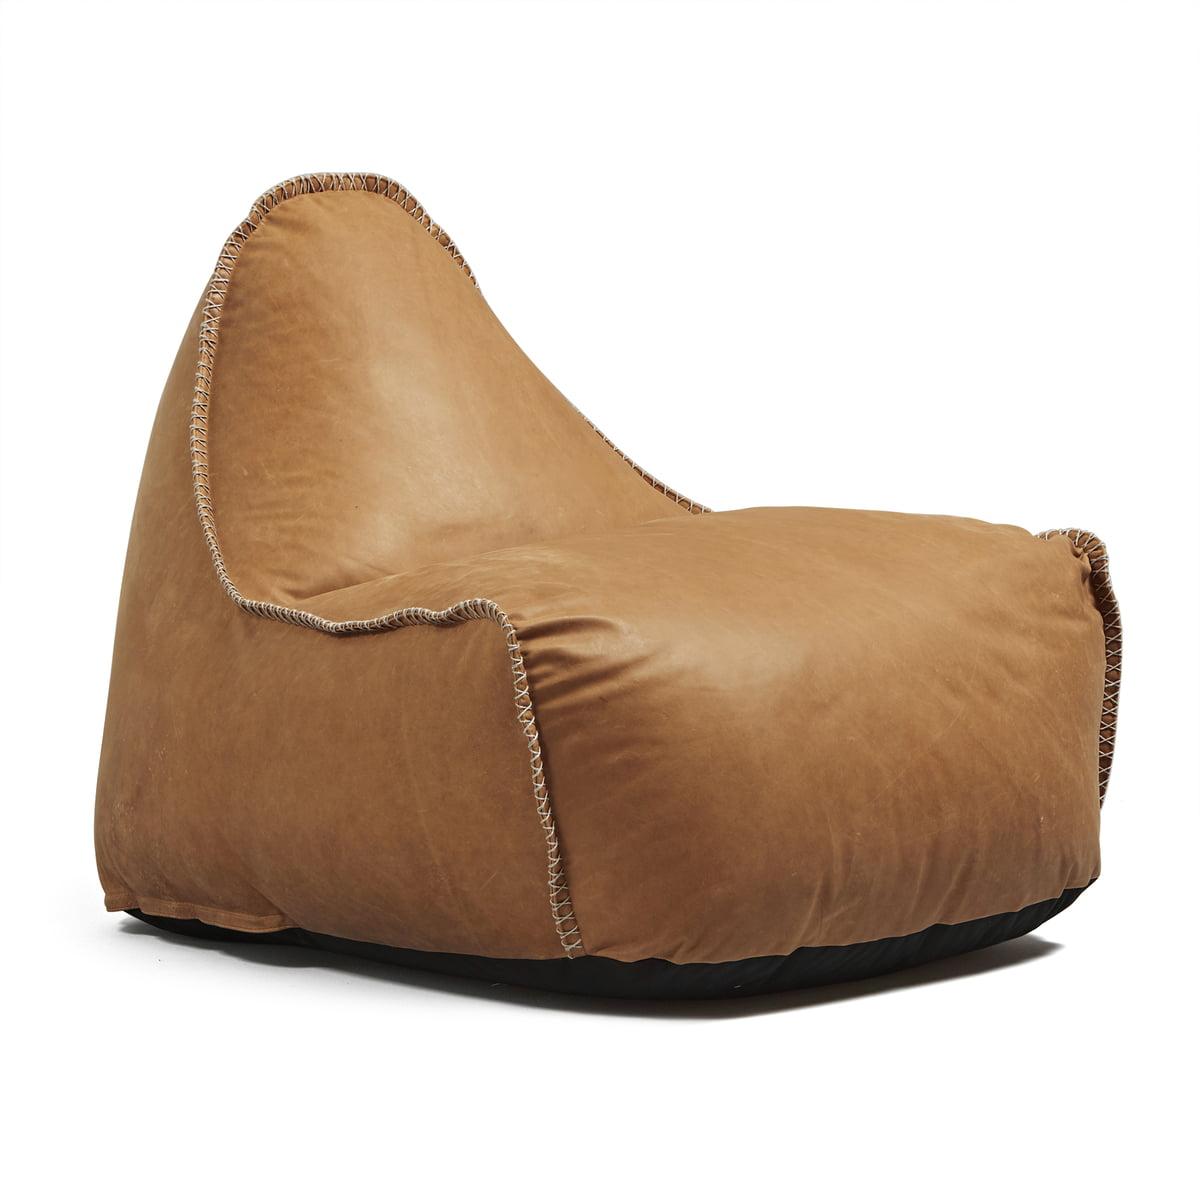 retro it dunes von sack it connox shop. Black Bedroom Furniture Sets. Home Design Ideas